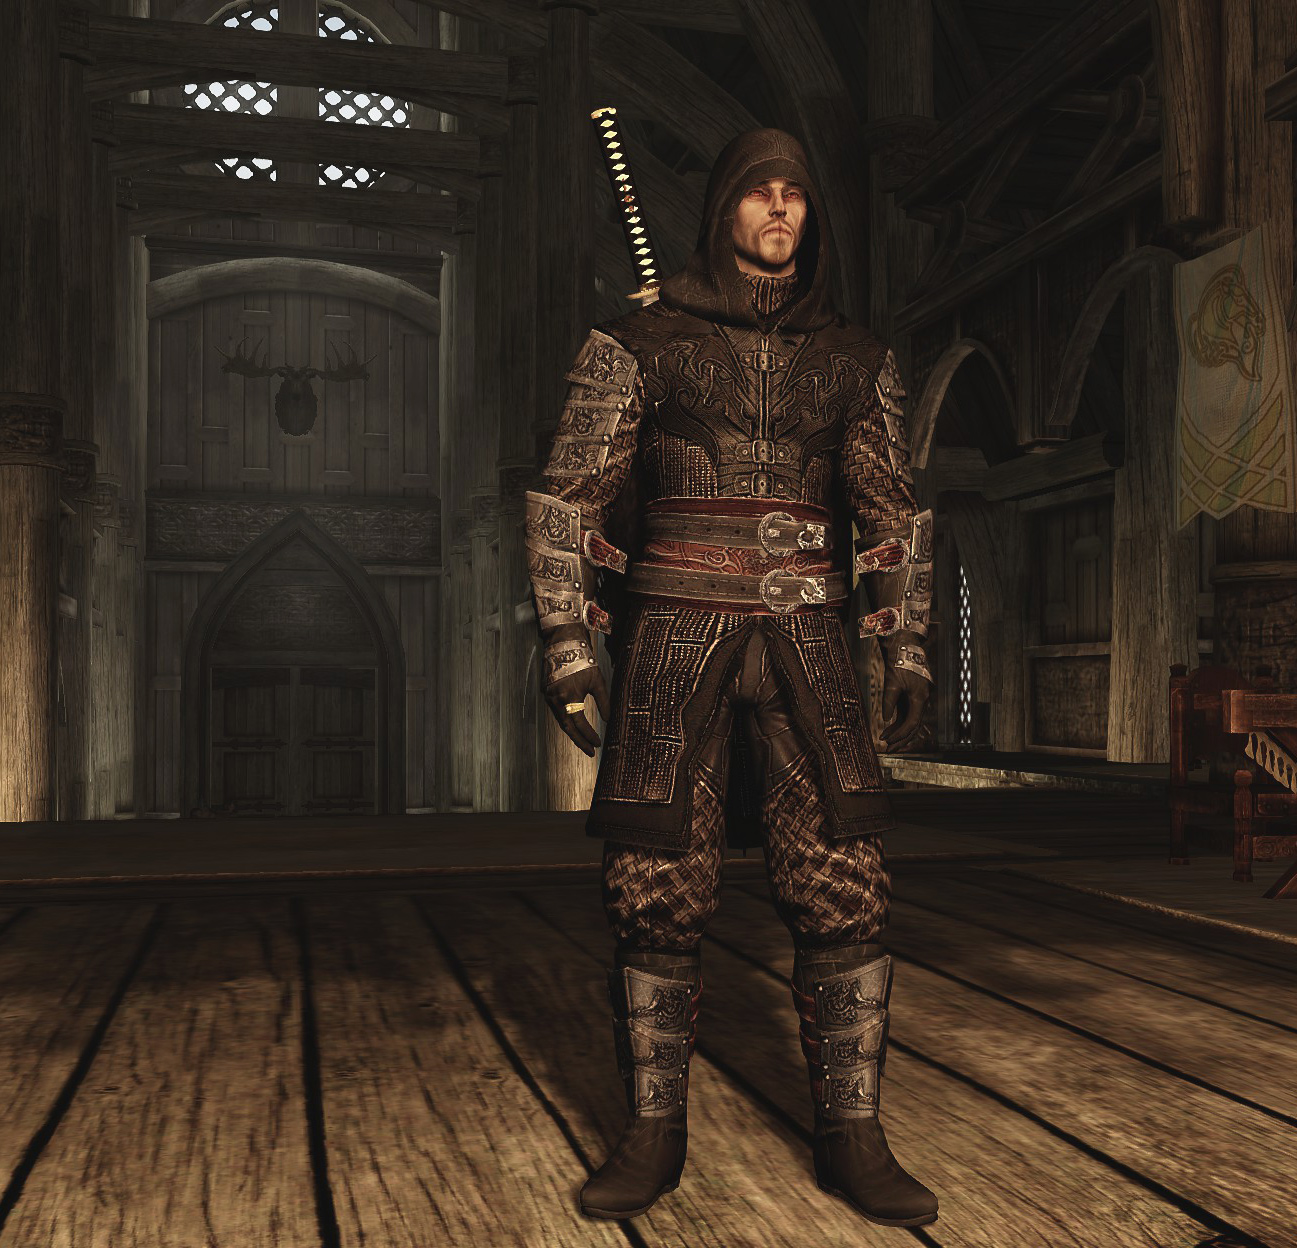 Skyrim Gear 3 Light Armor